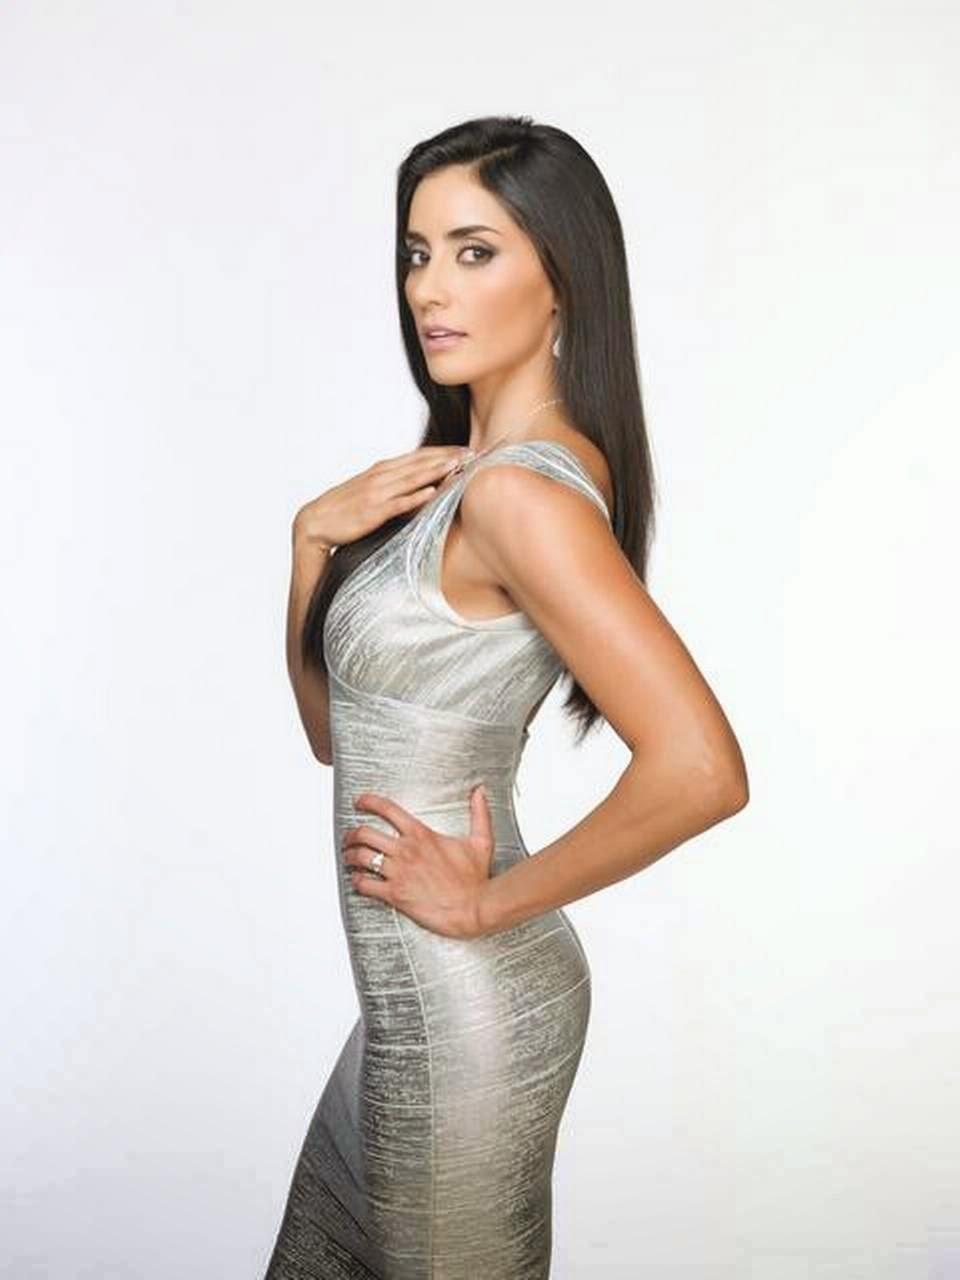 Paola Nunez new images